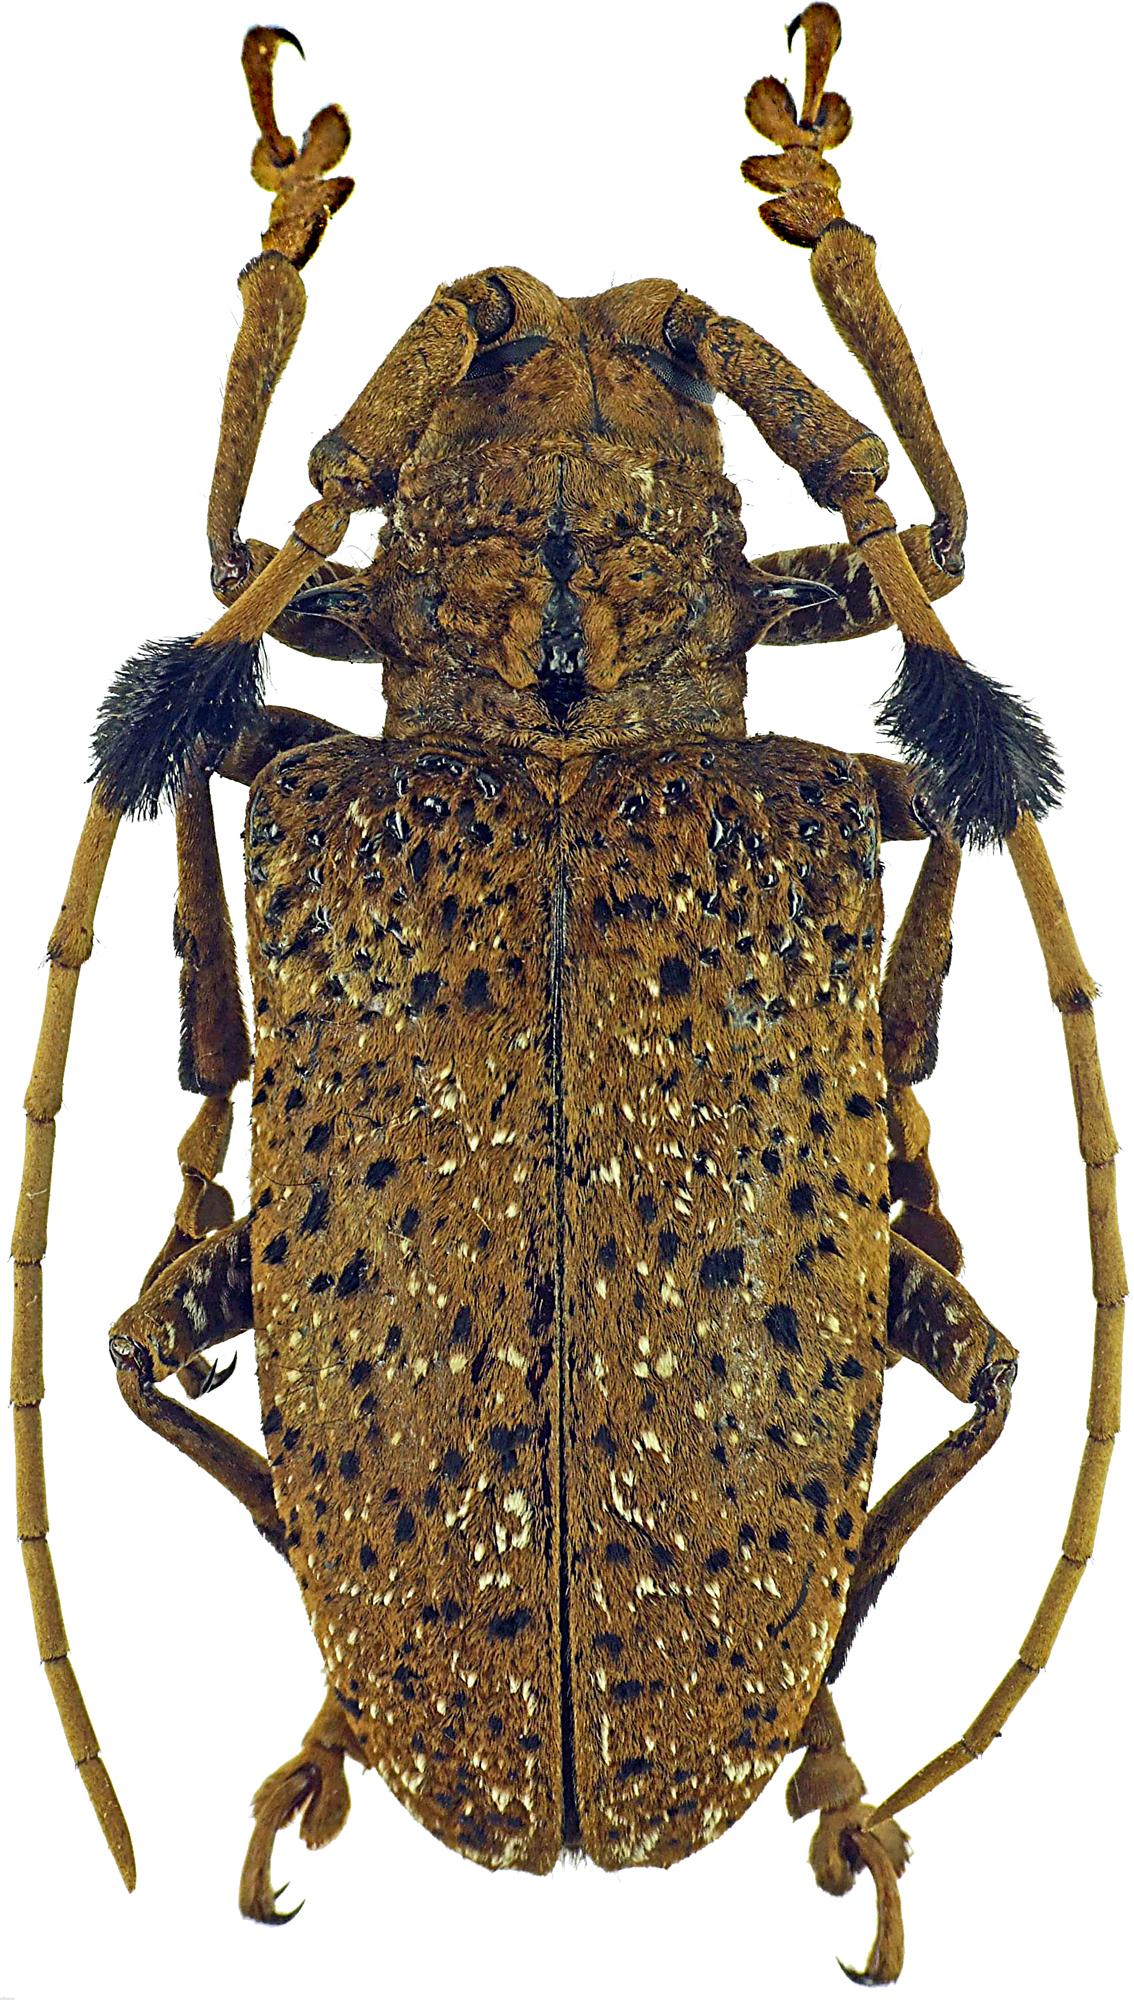 Aristobia freneyi 12045cz48.jpg